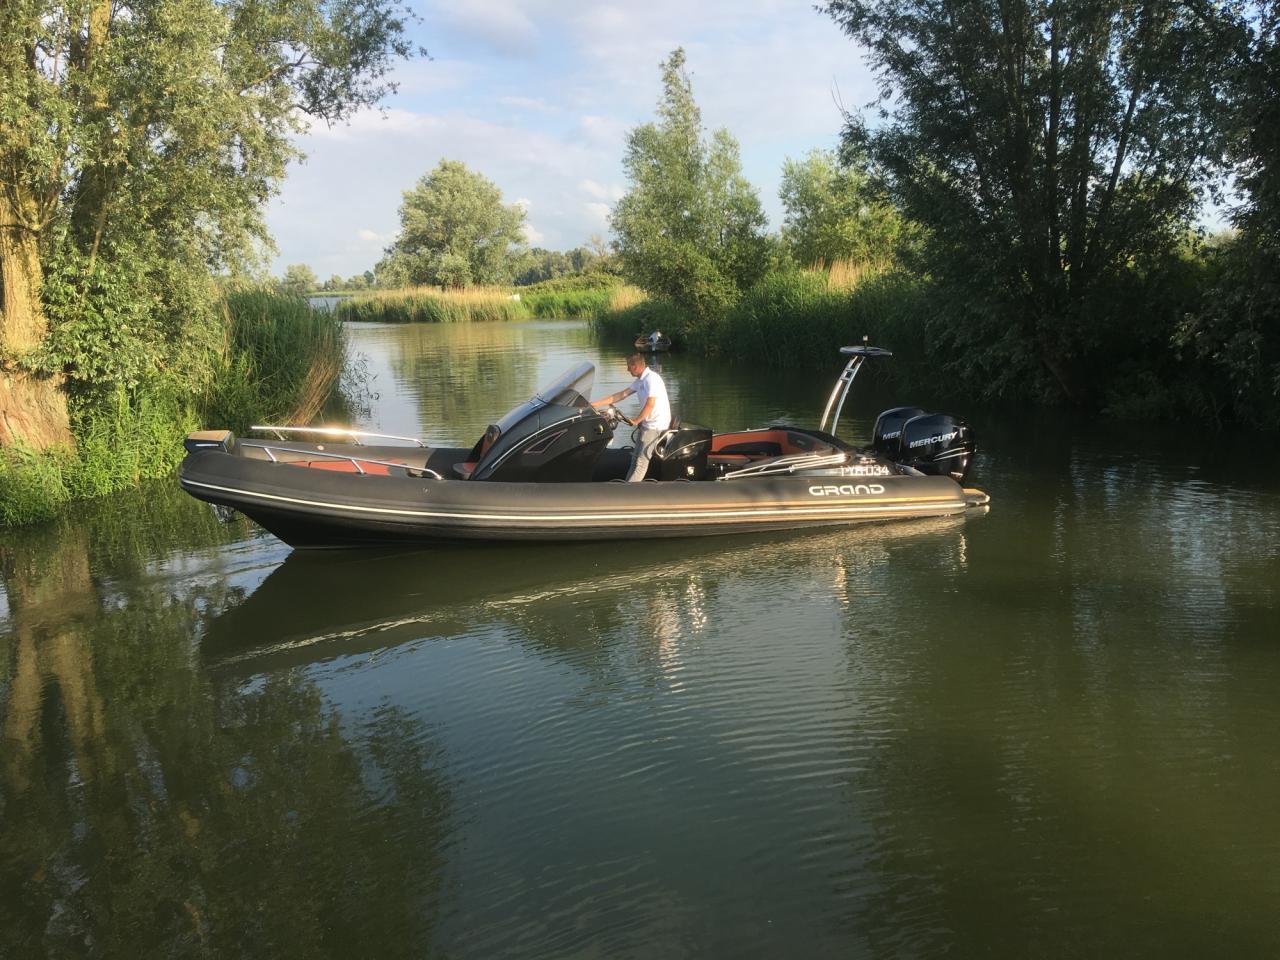 Grand 850 rib met 2x Mercury Verado 225 pk 3